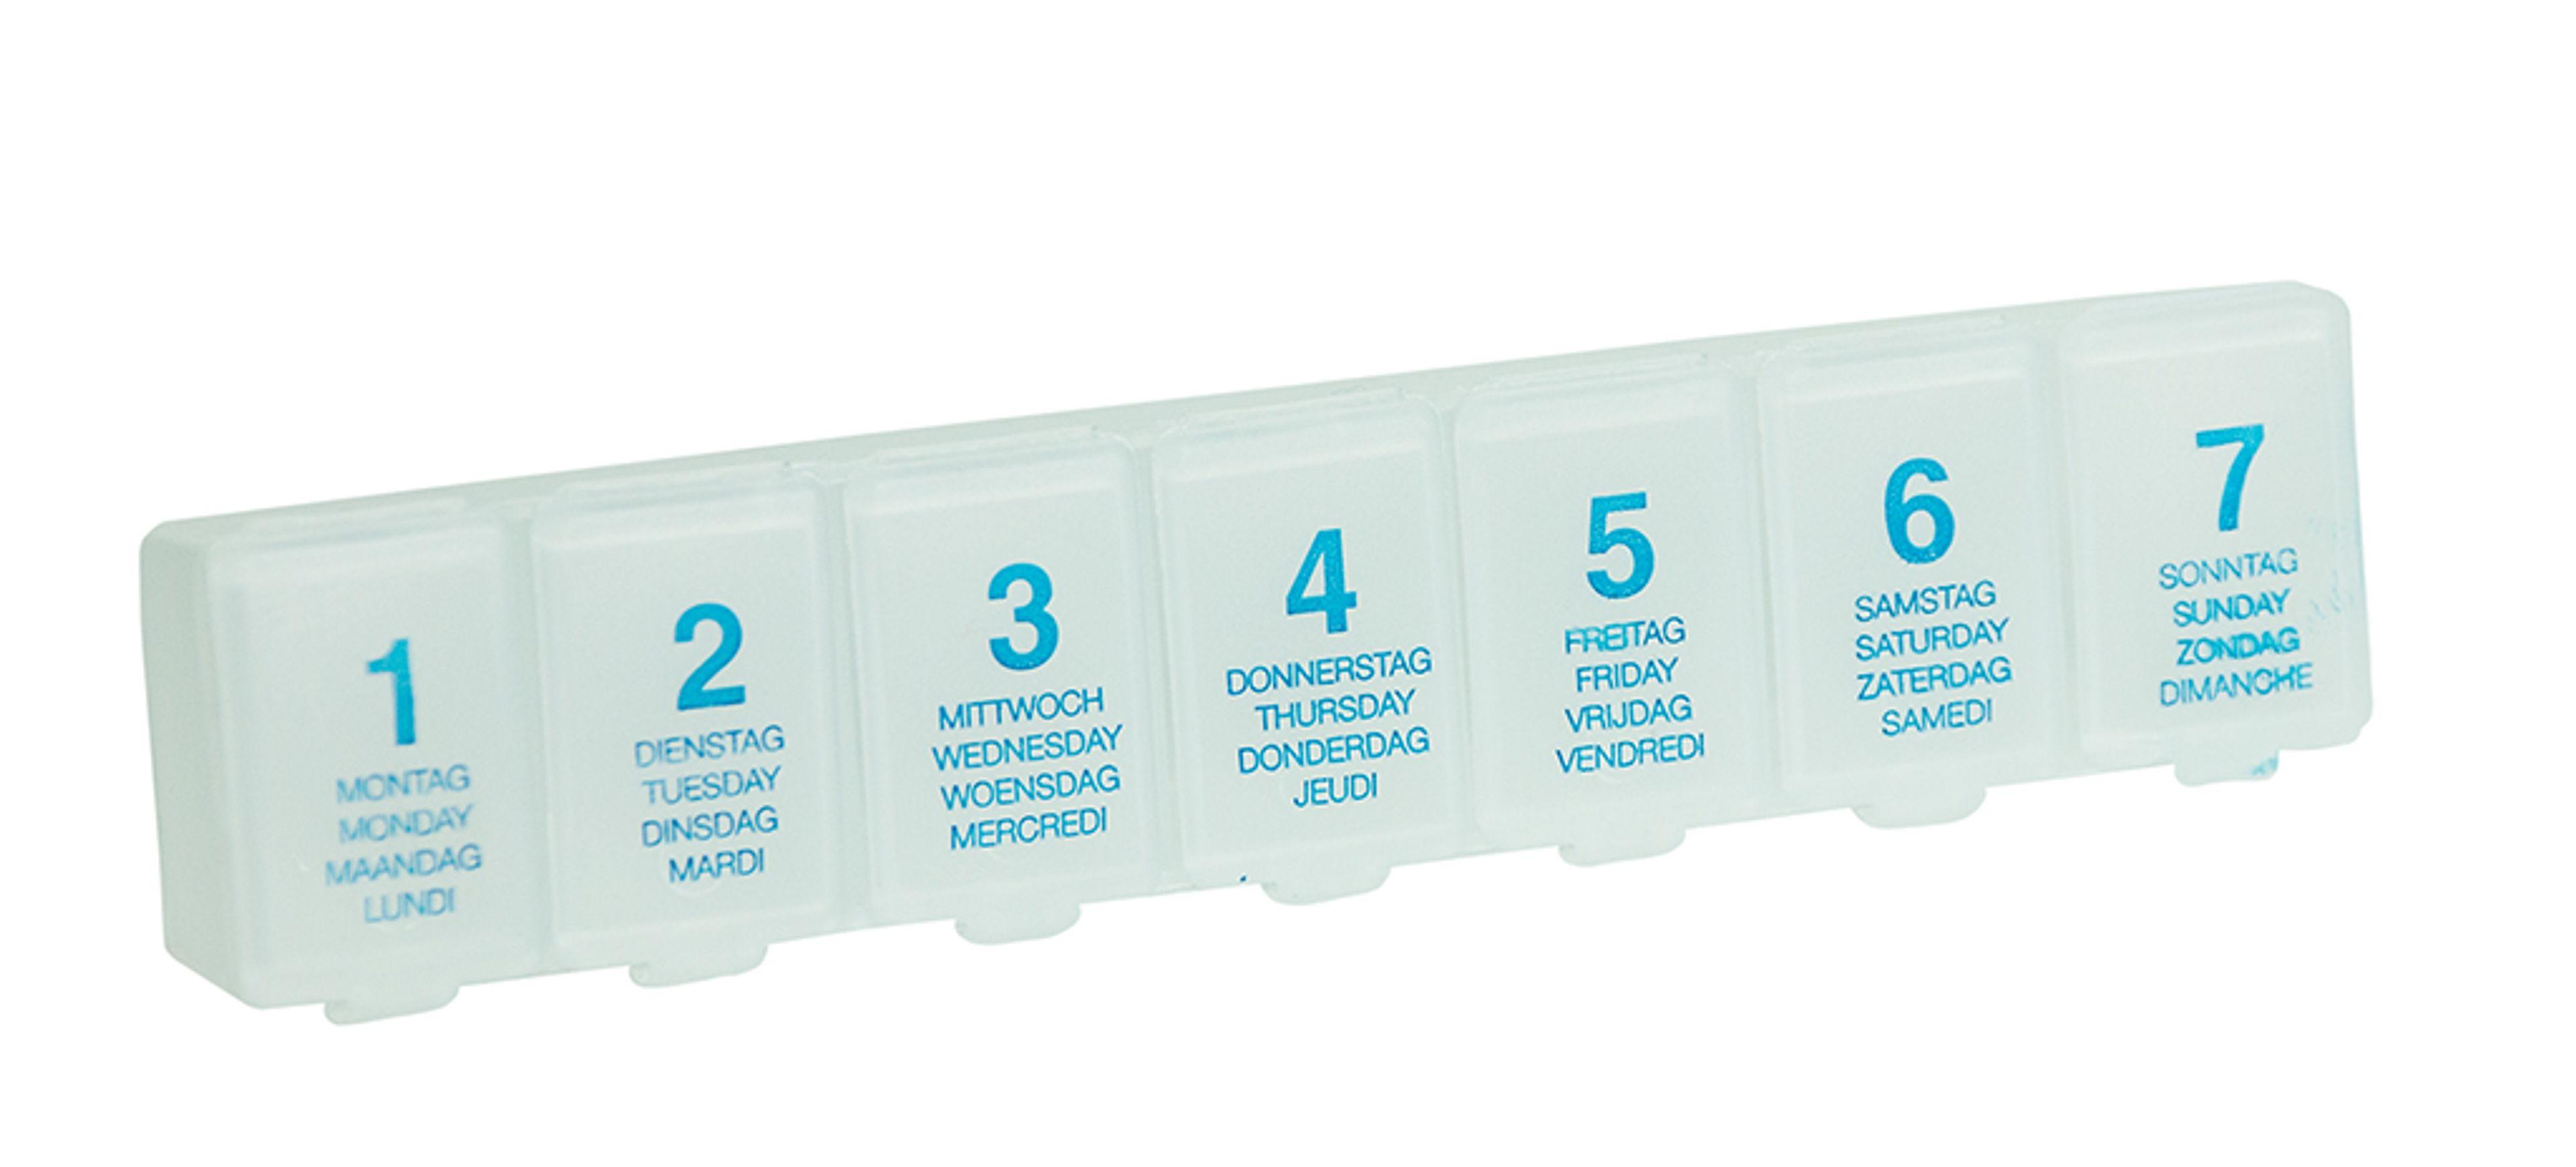 pillenbox pillendose tablettendose medikamente box dose 7 tage transparent haushaltswaren. Black Bedroom Furniture Sets. Home Design Ideas